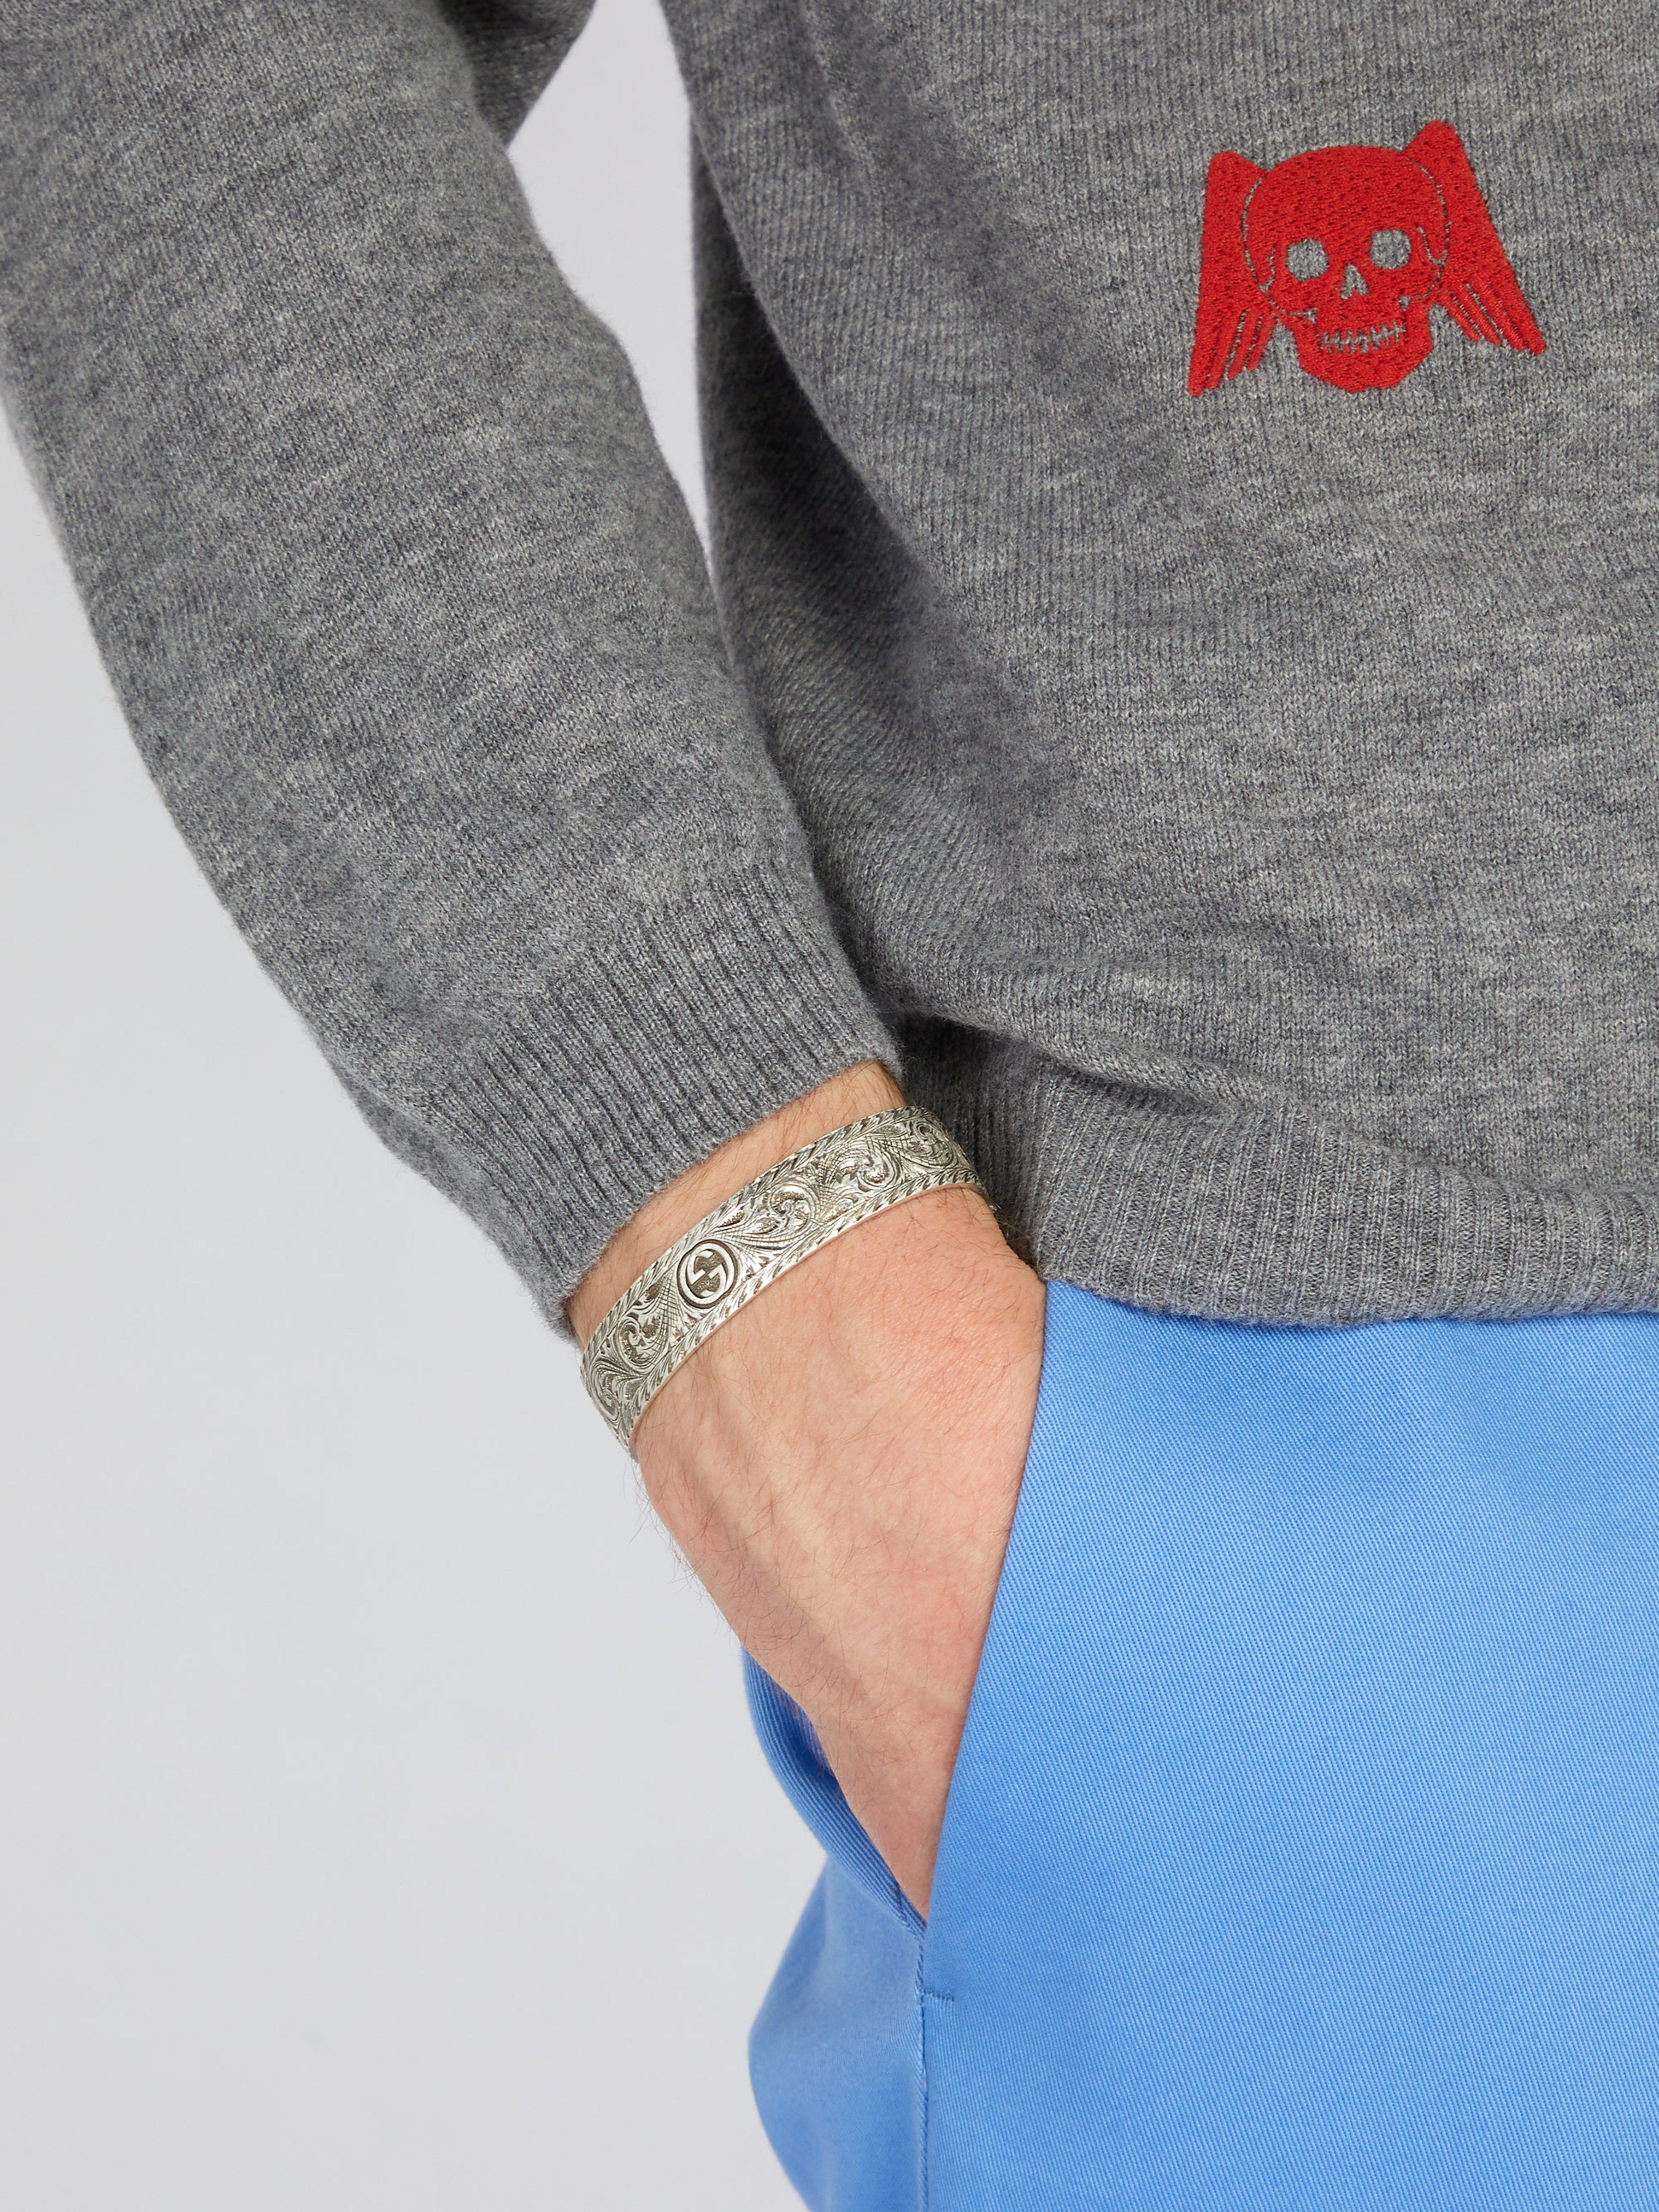 ca7c5b07401 Gucci Tiger Head Sterling Silver Cuff Bracelet in Metallic for Men - Lyst